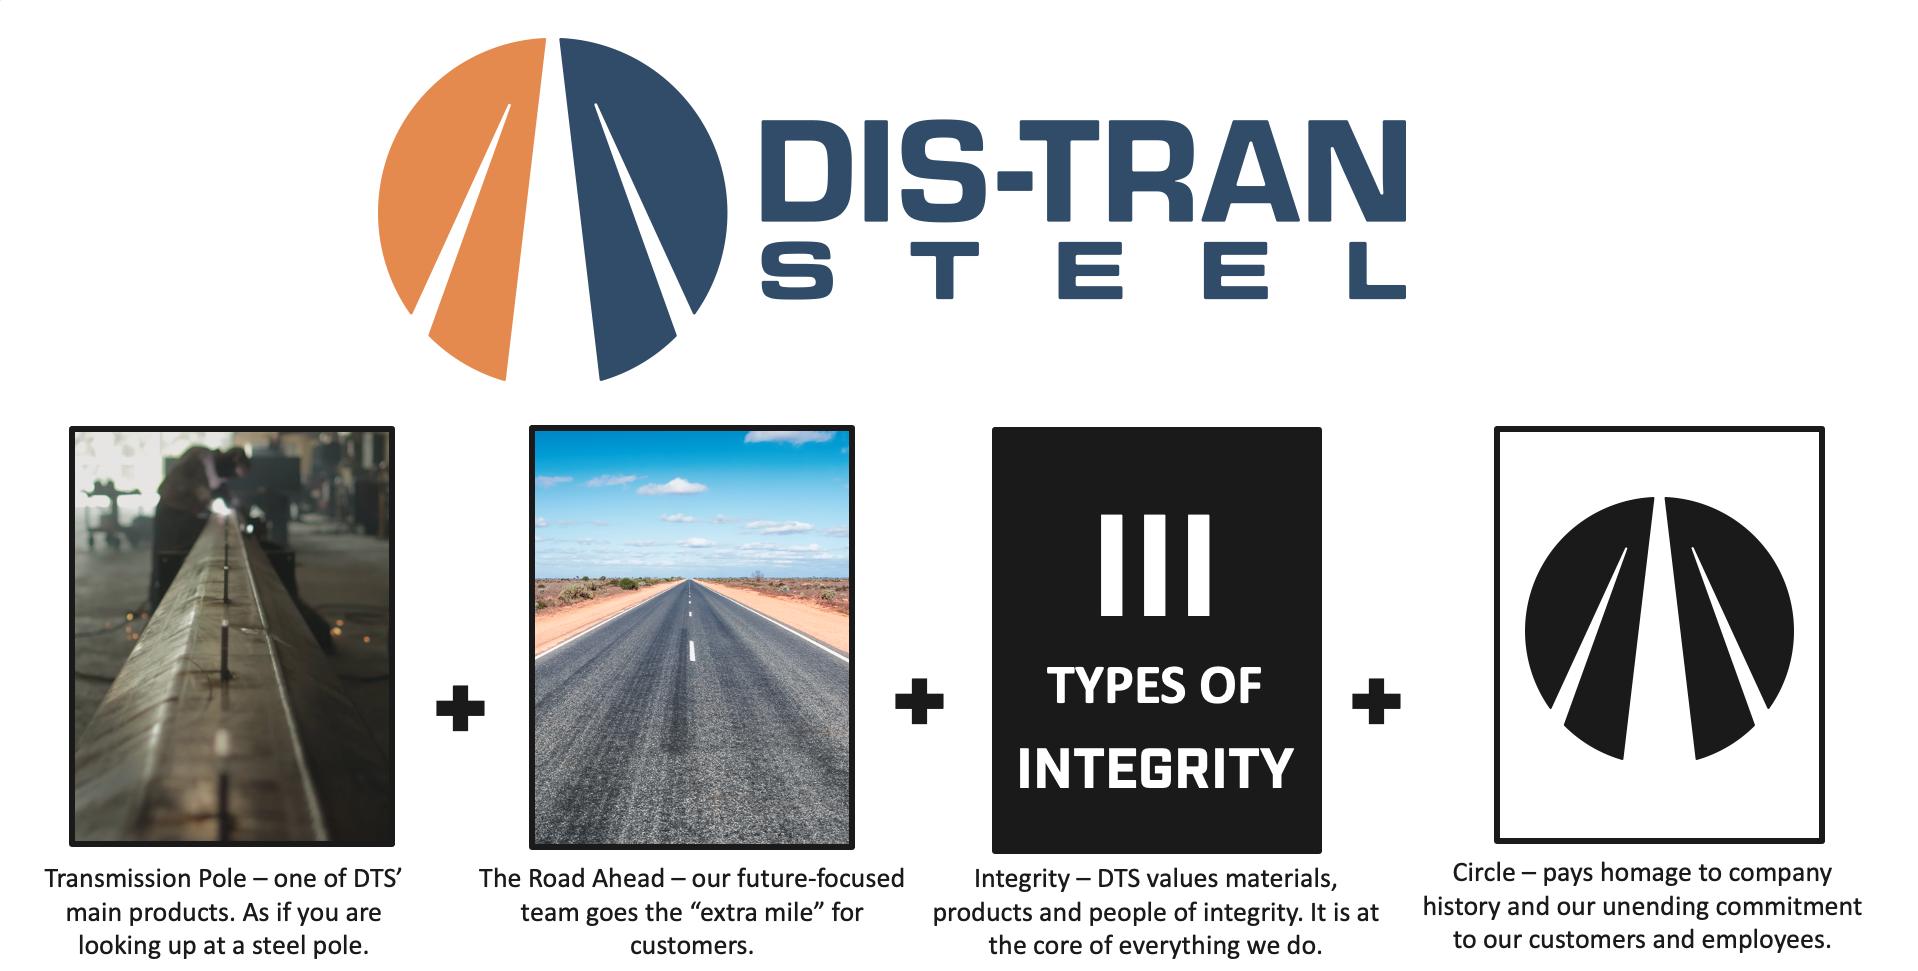 DTS Logo Explained